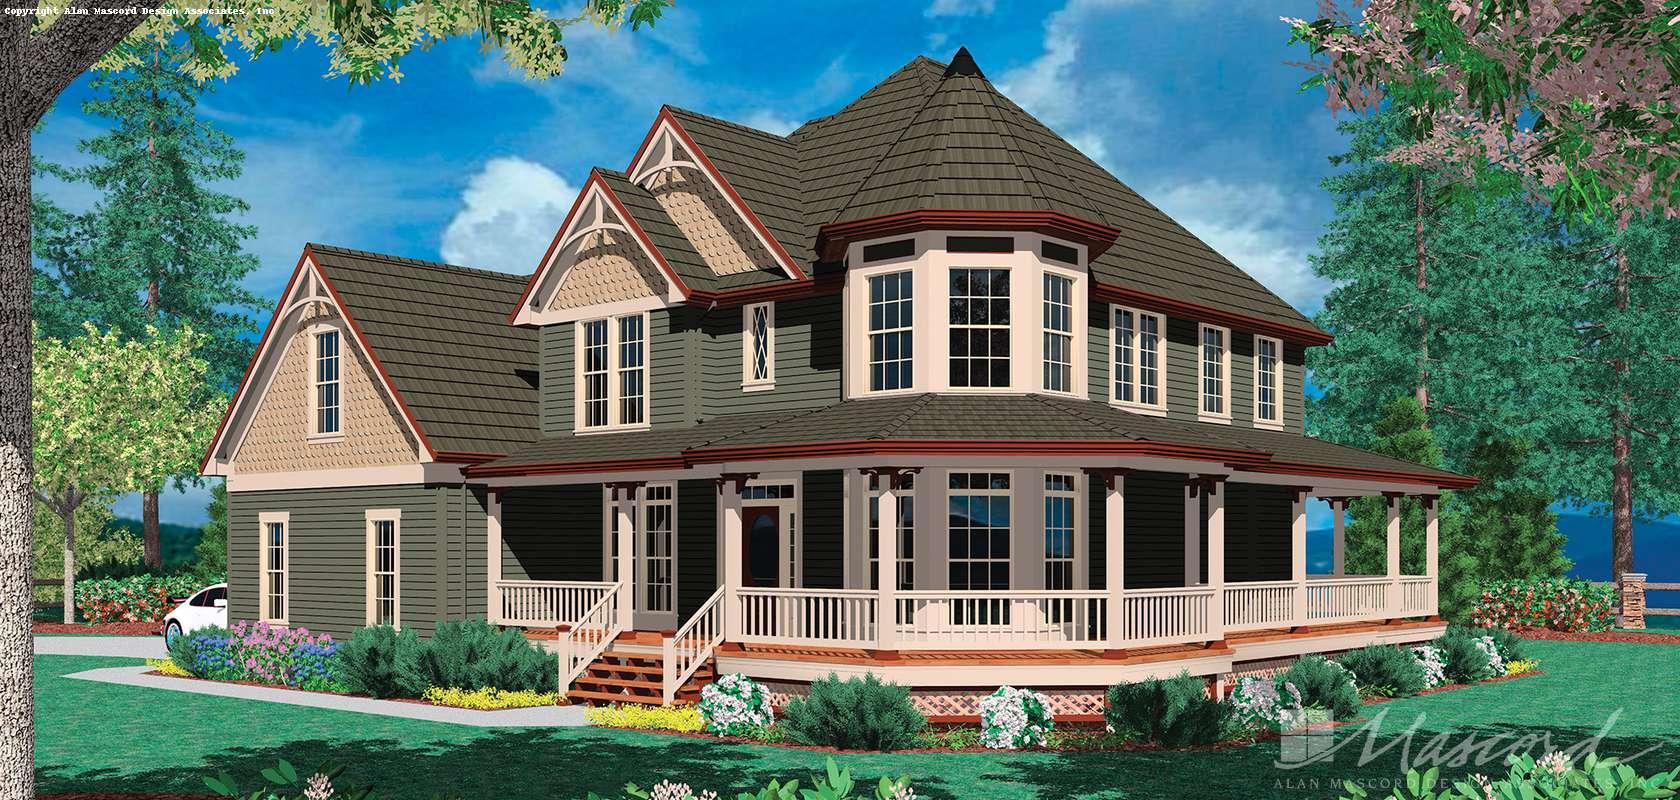 Mascord House Plan 22128: The Kensington